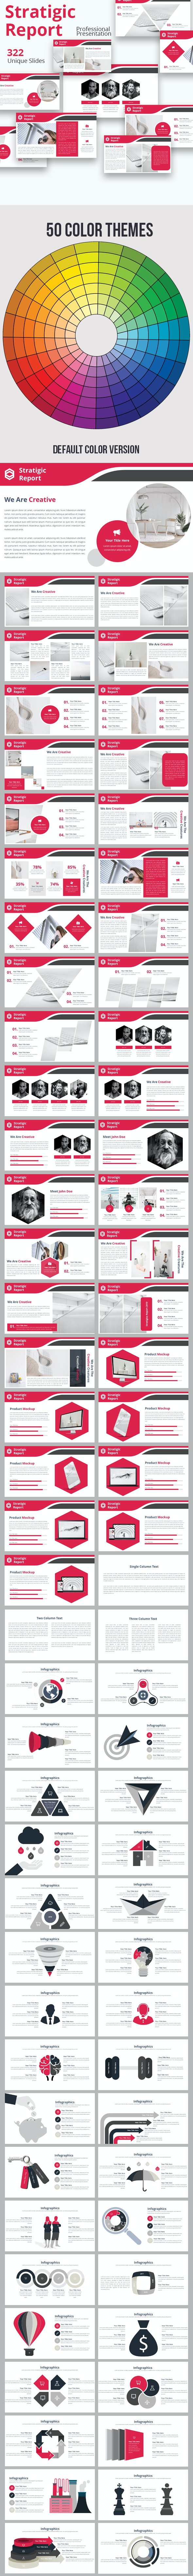 Stratigic Report Powerpoint Template - Business PowerPoint Templates